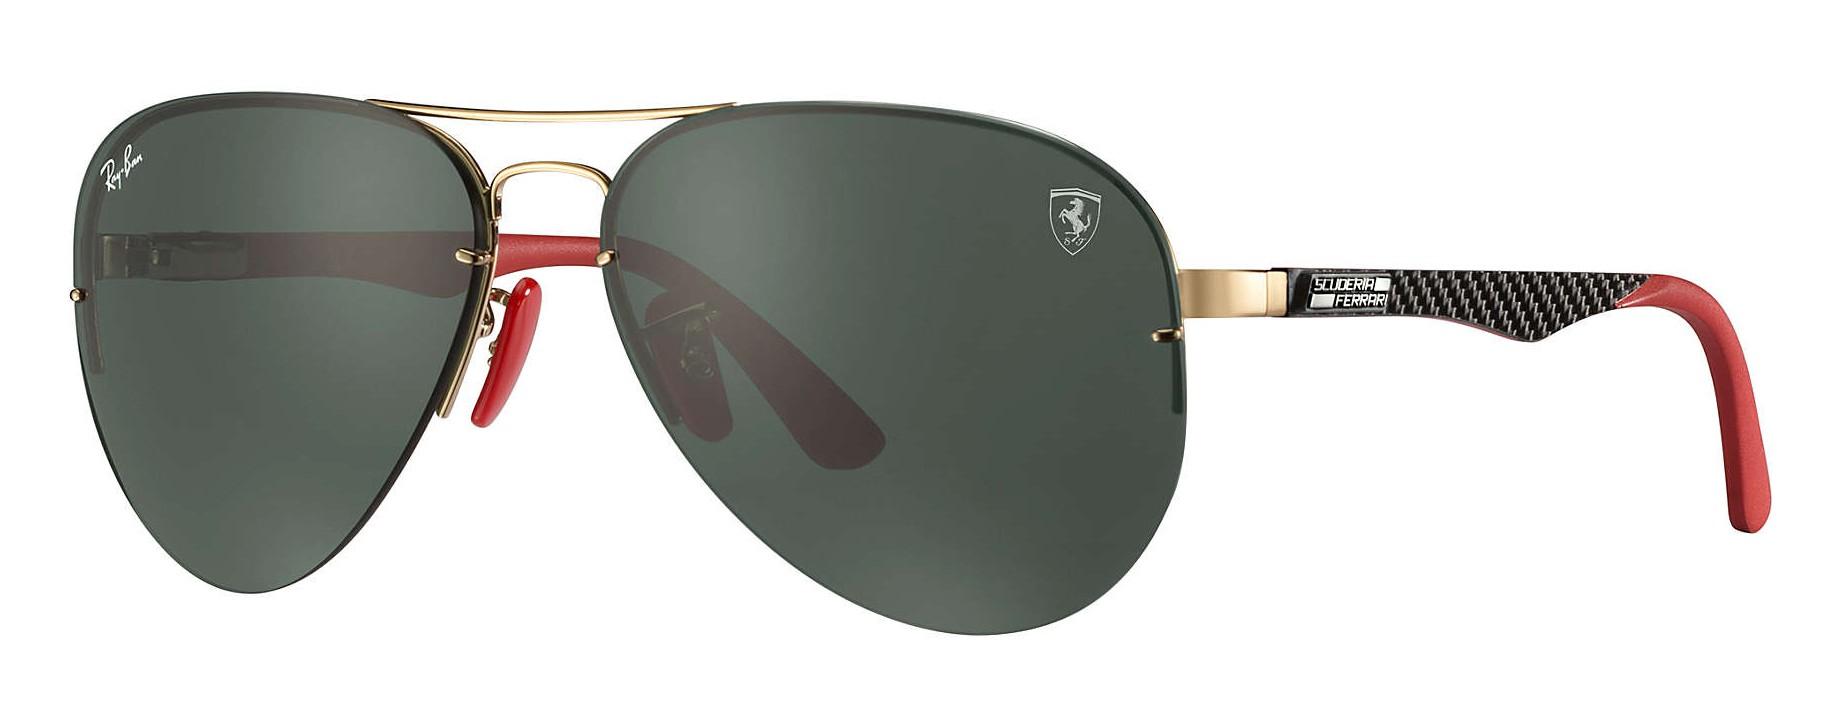 Ray Ban Rb3460m F00871 Original Scuderia Ferrari Collection Aviator Gold Black Red Green Classic Sunglass Eyewear Avvenice